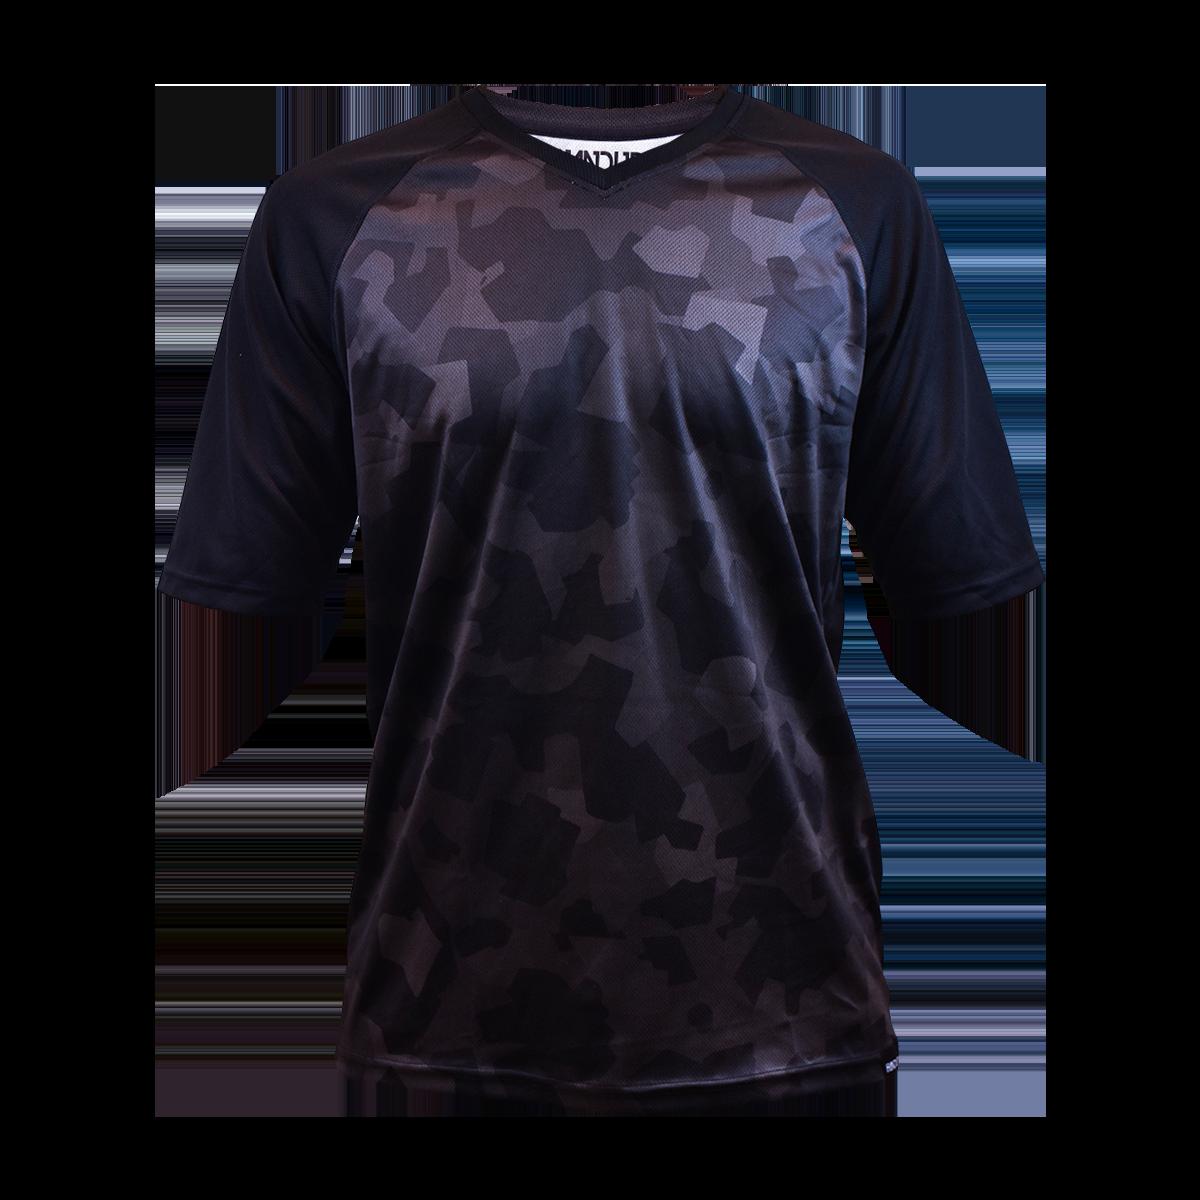 Night Ops Short Sleeve Jersey  $38